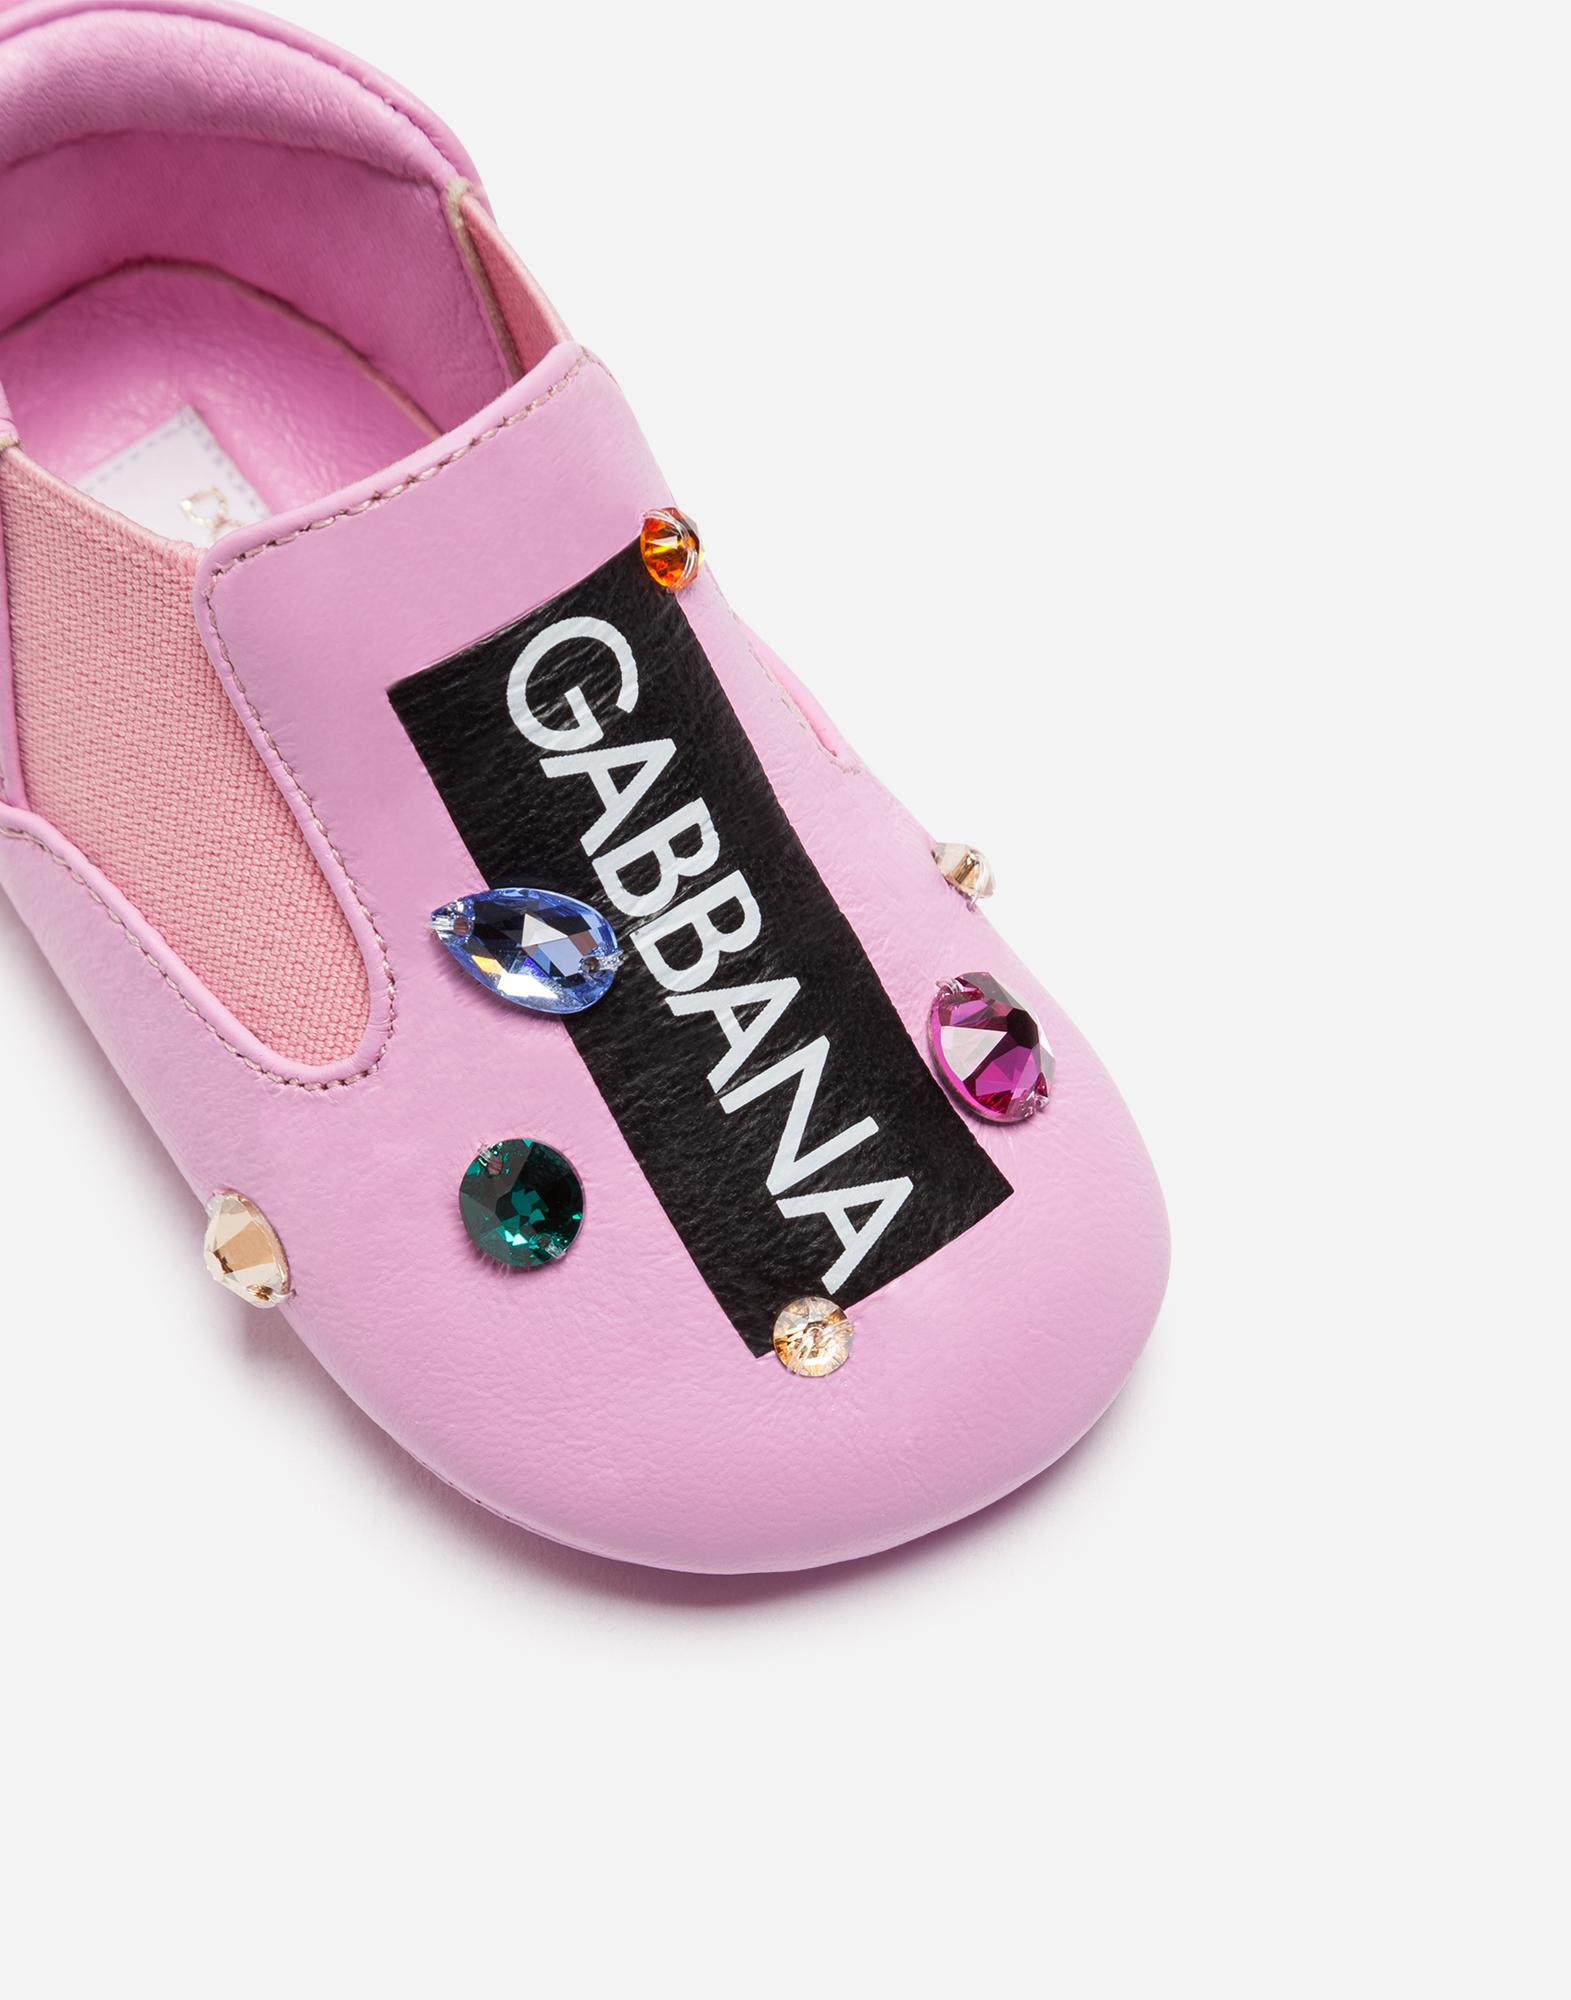 Dolce & Gabbana SLIPPERS WITH RHINESTONES